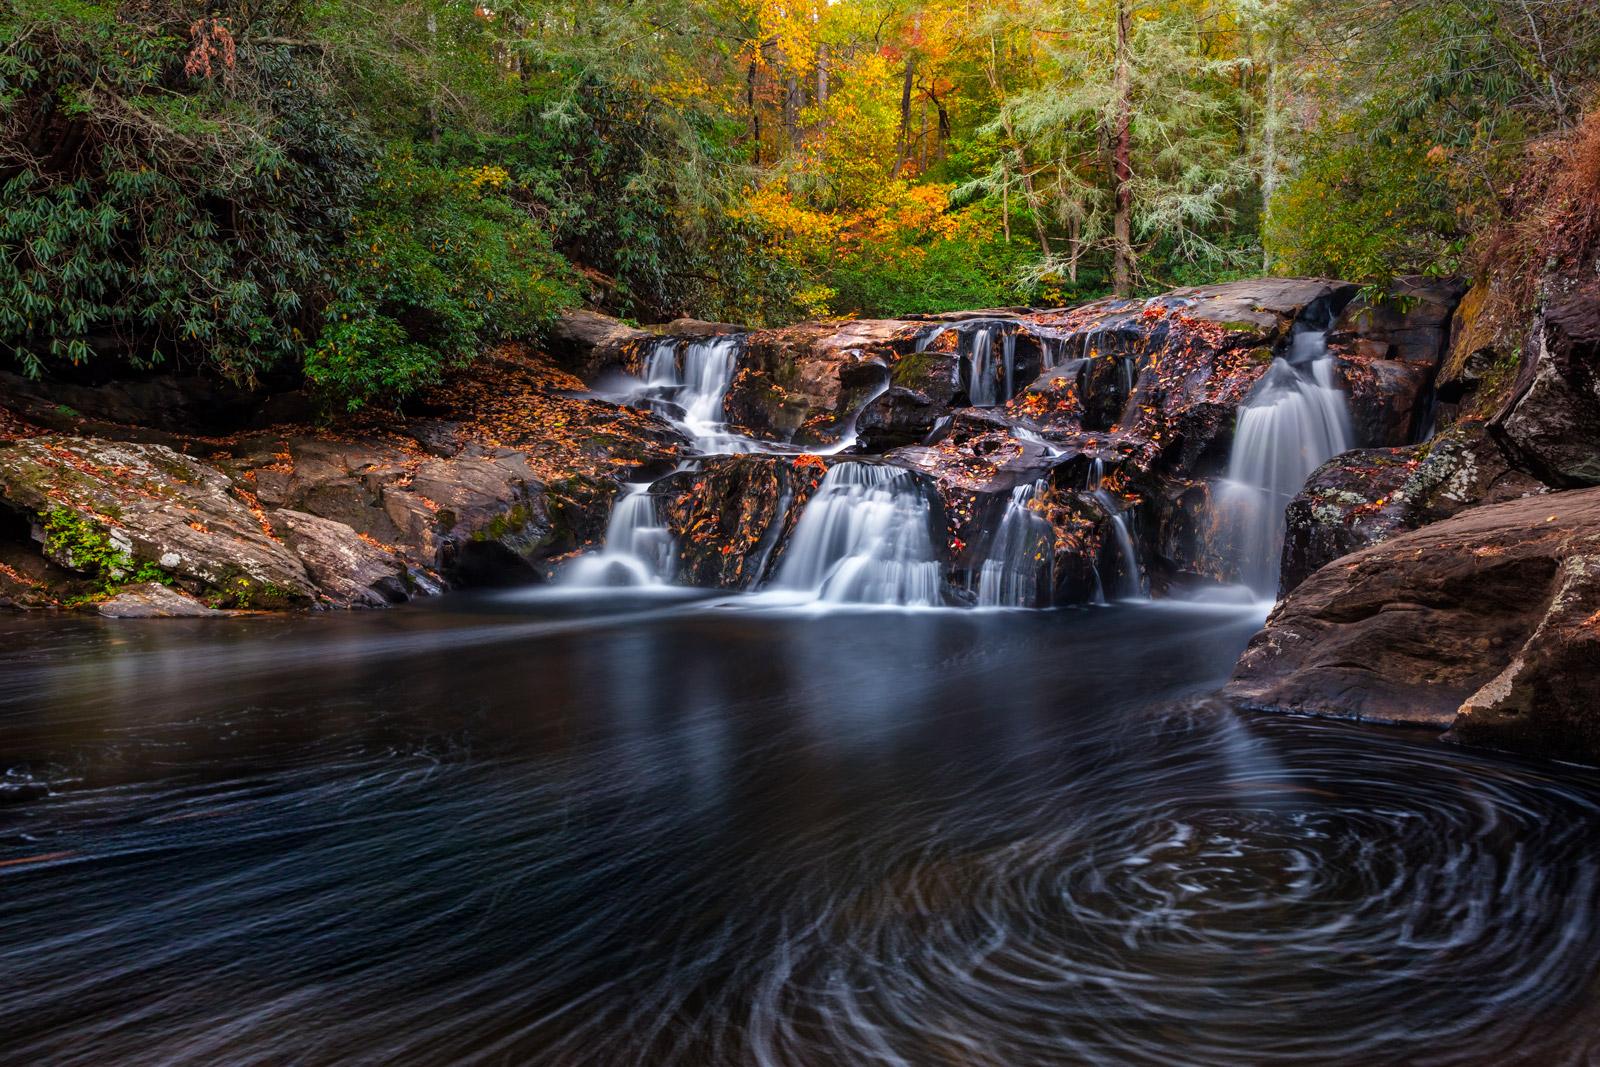 Georgia, Dicks Creek, Dicks Creek Falls, Waterfall, River, Swirls, limited edition, photograph, fall colors, fine art, landscape, photo